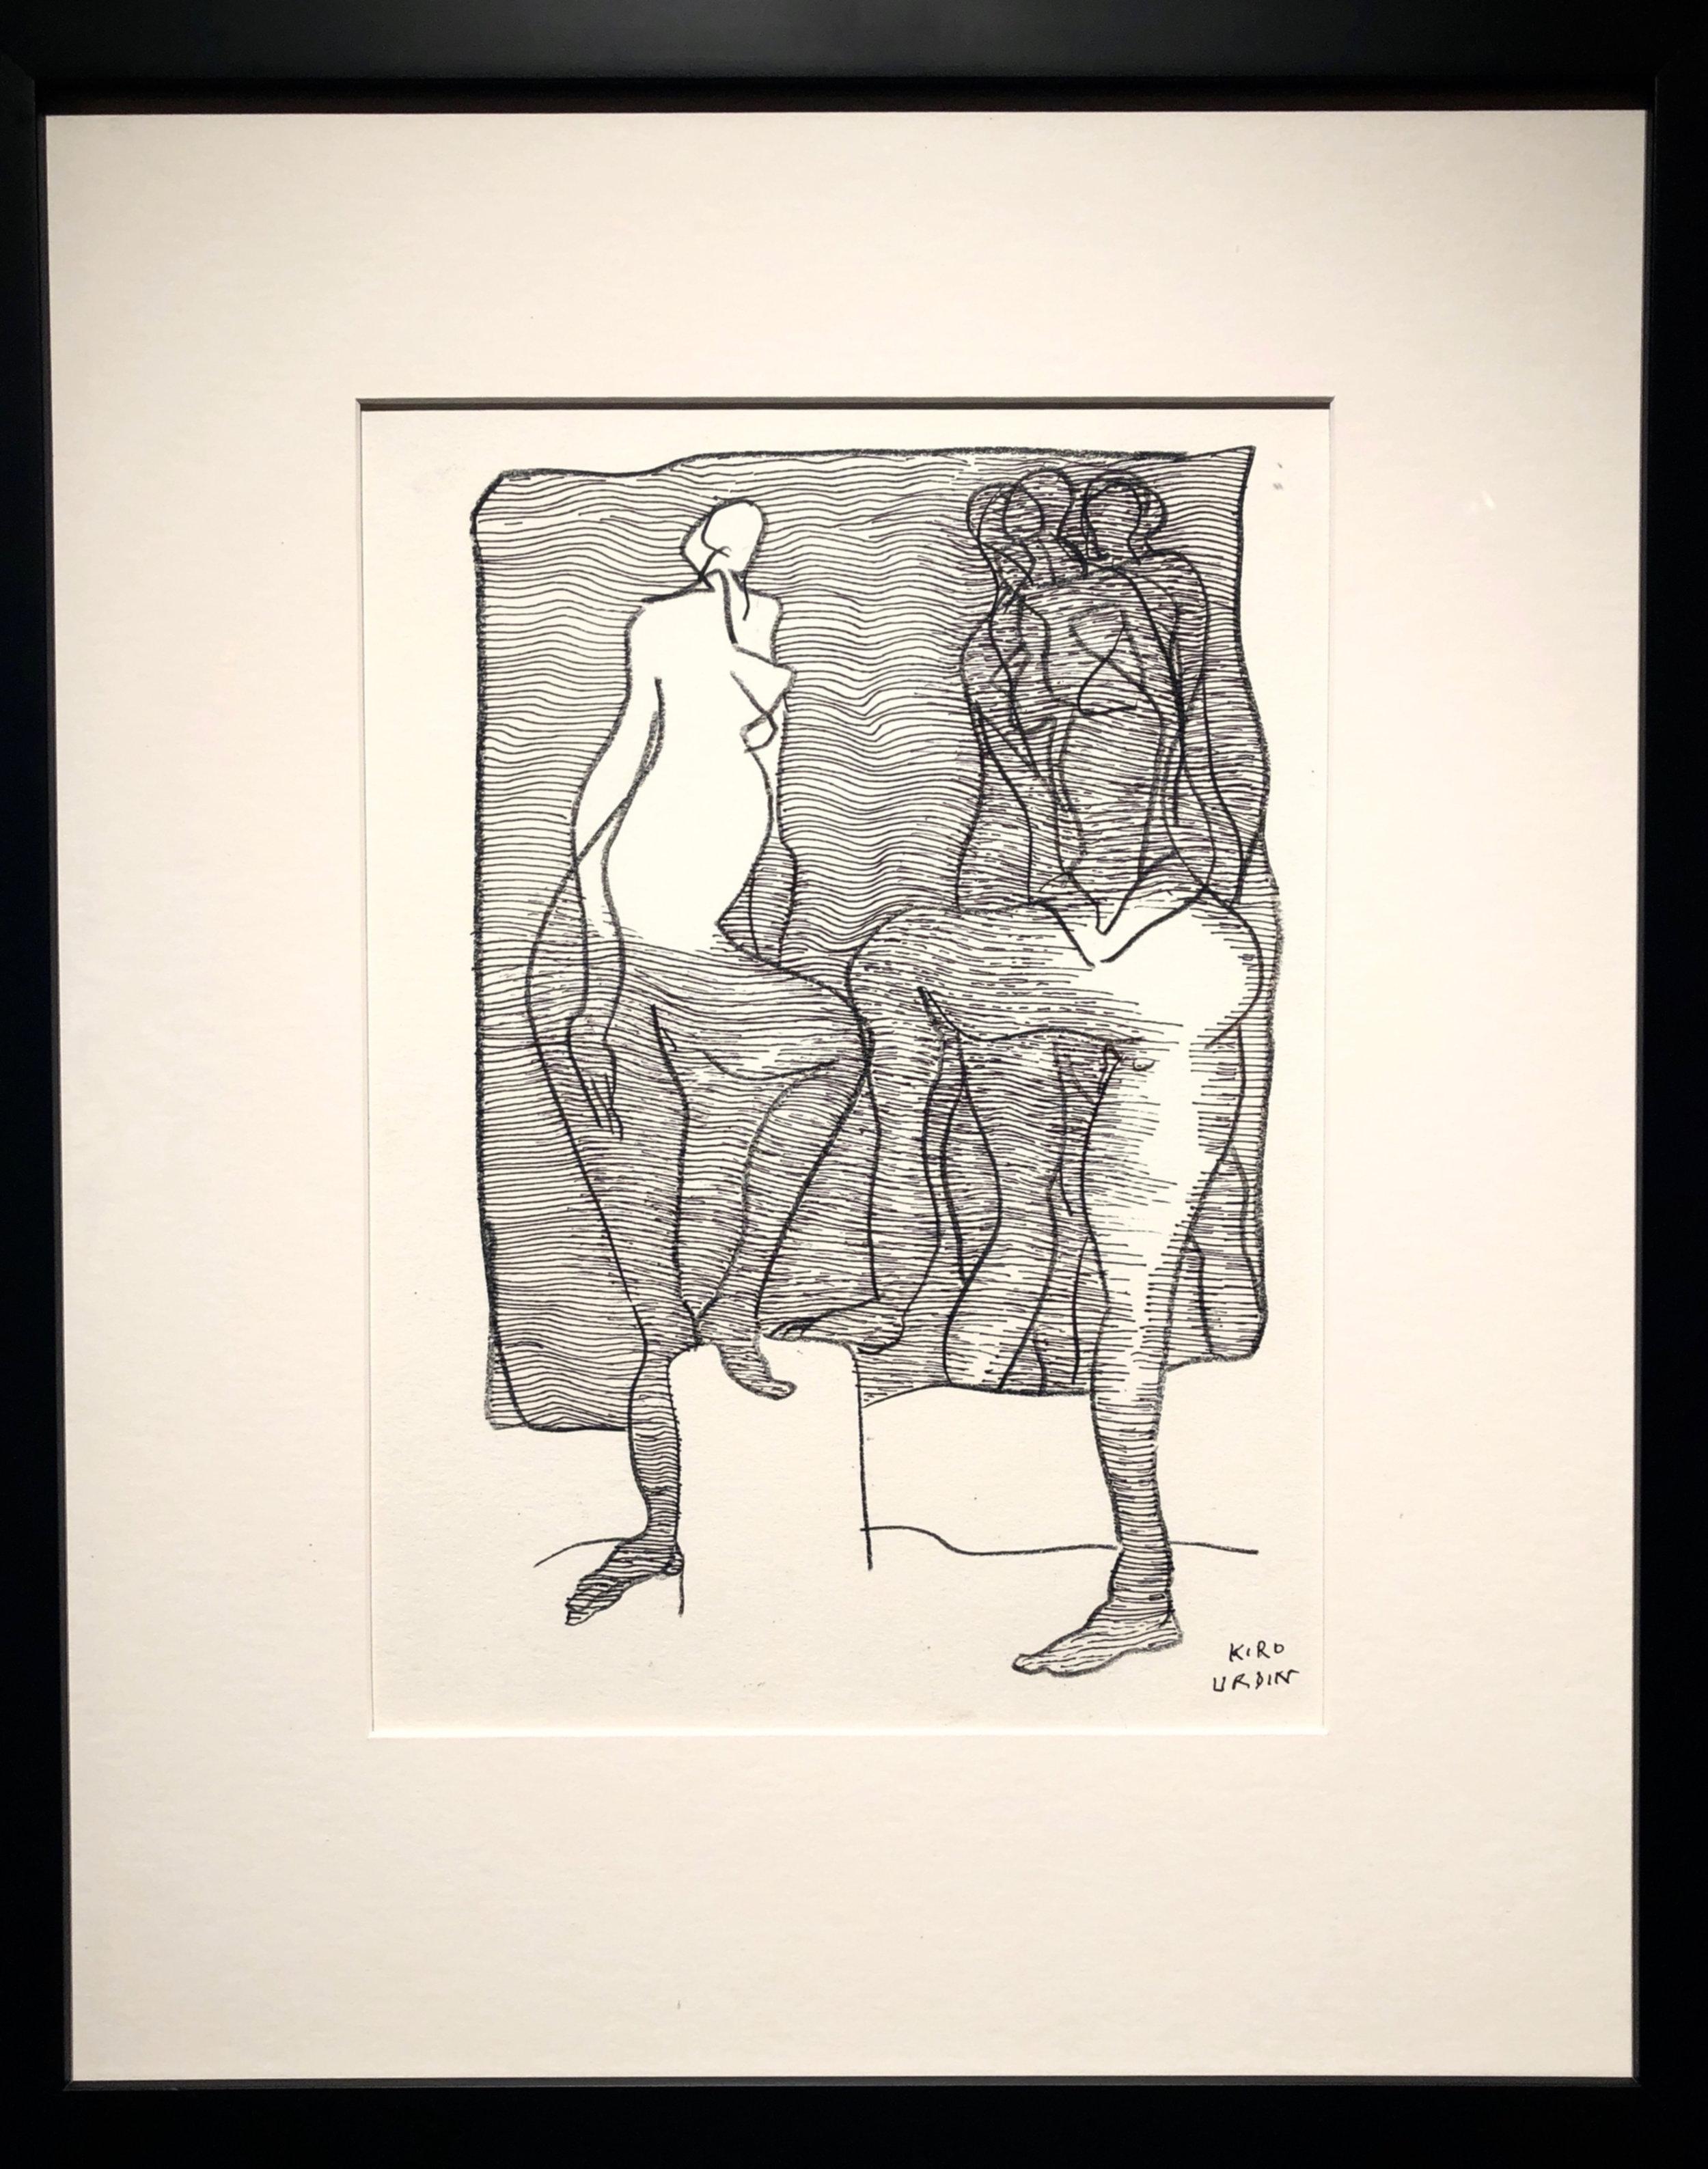 Nude V - (14 x 11)